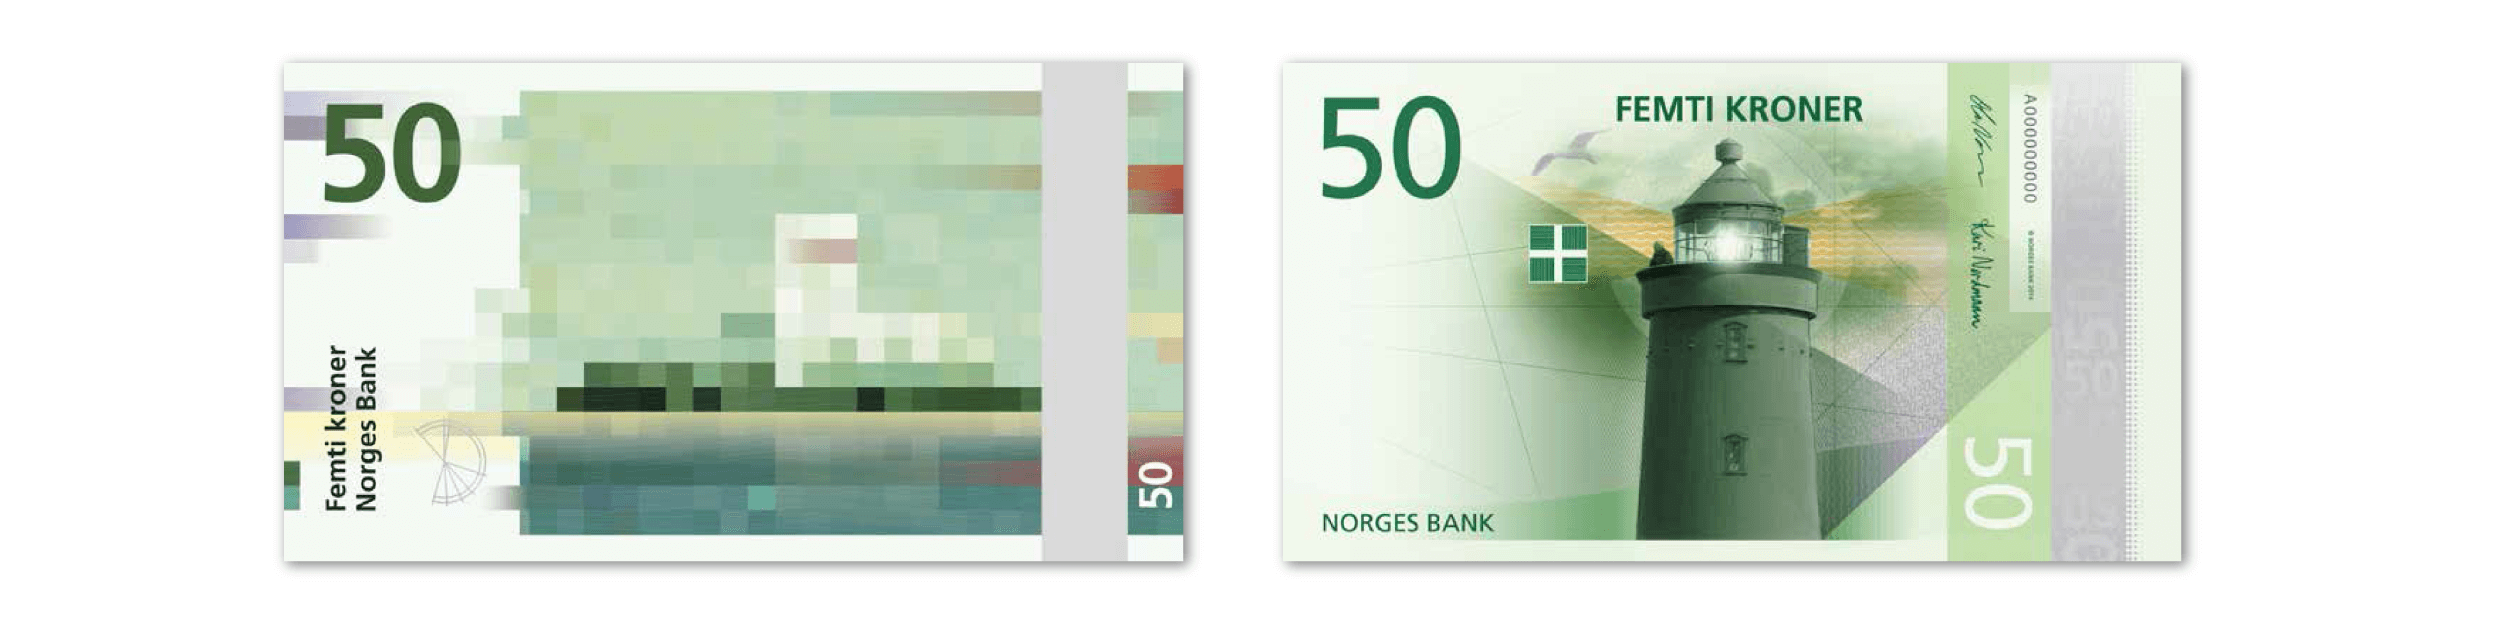 Norway Currency Redesign_50-kroner